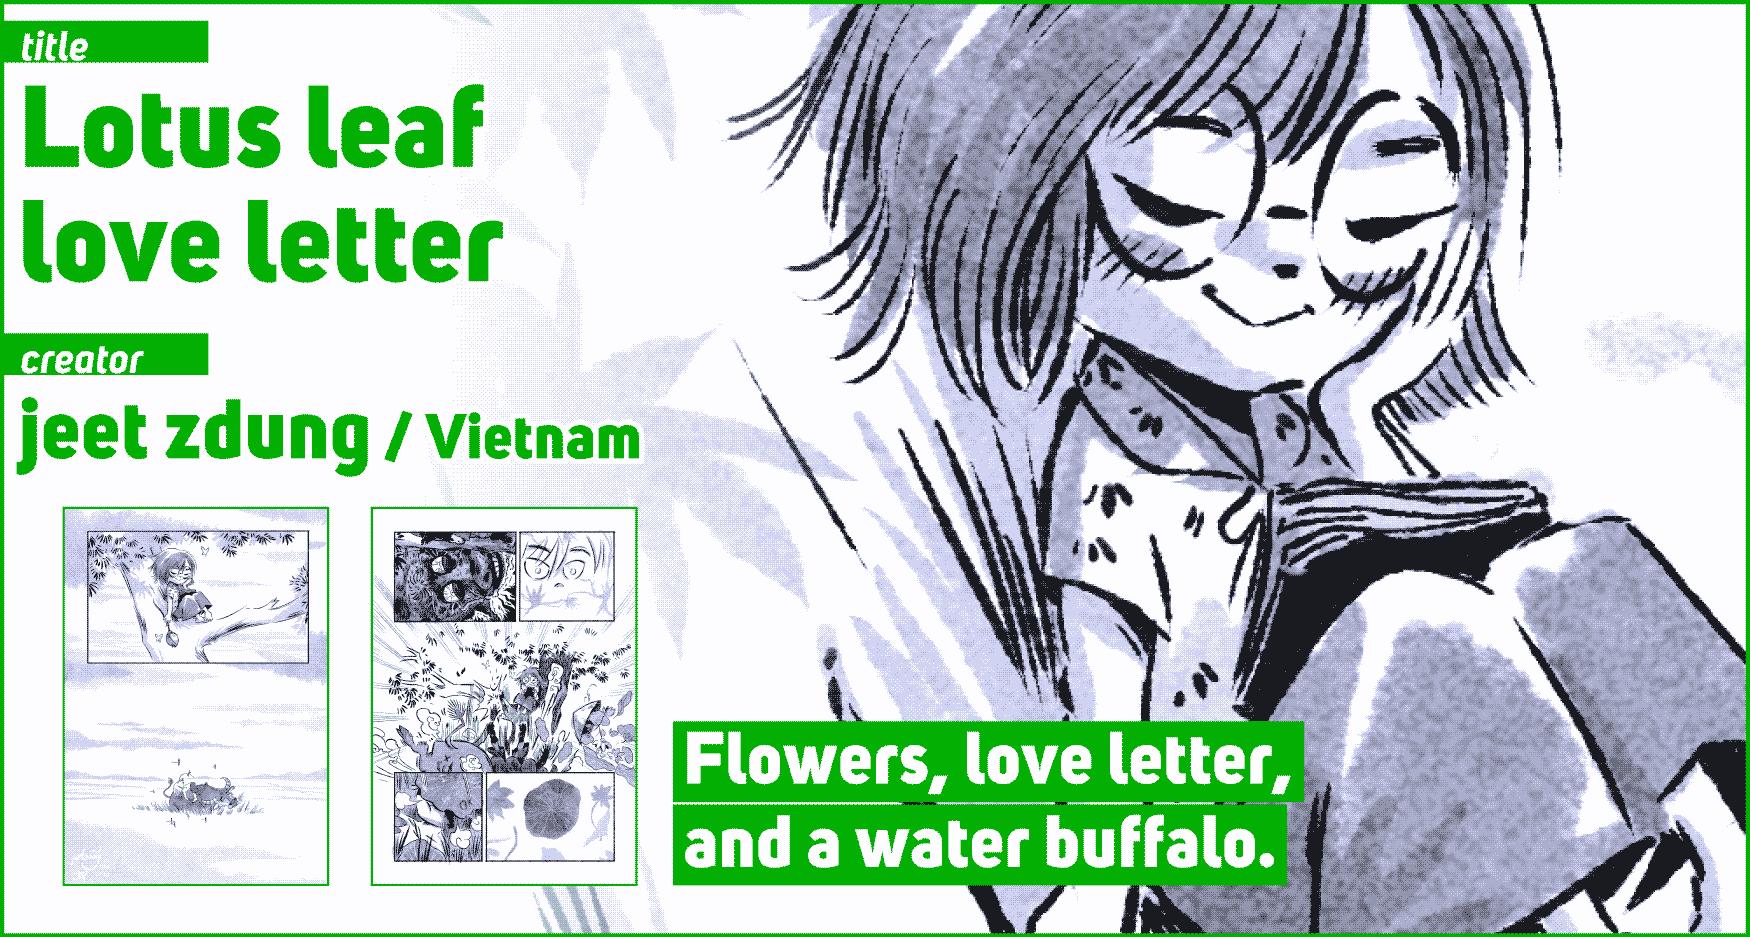 Lotus leaf love letter